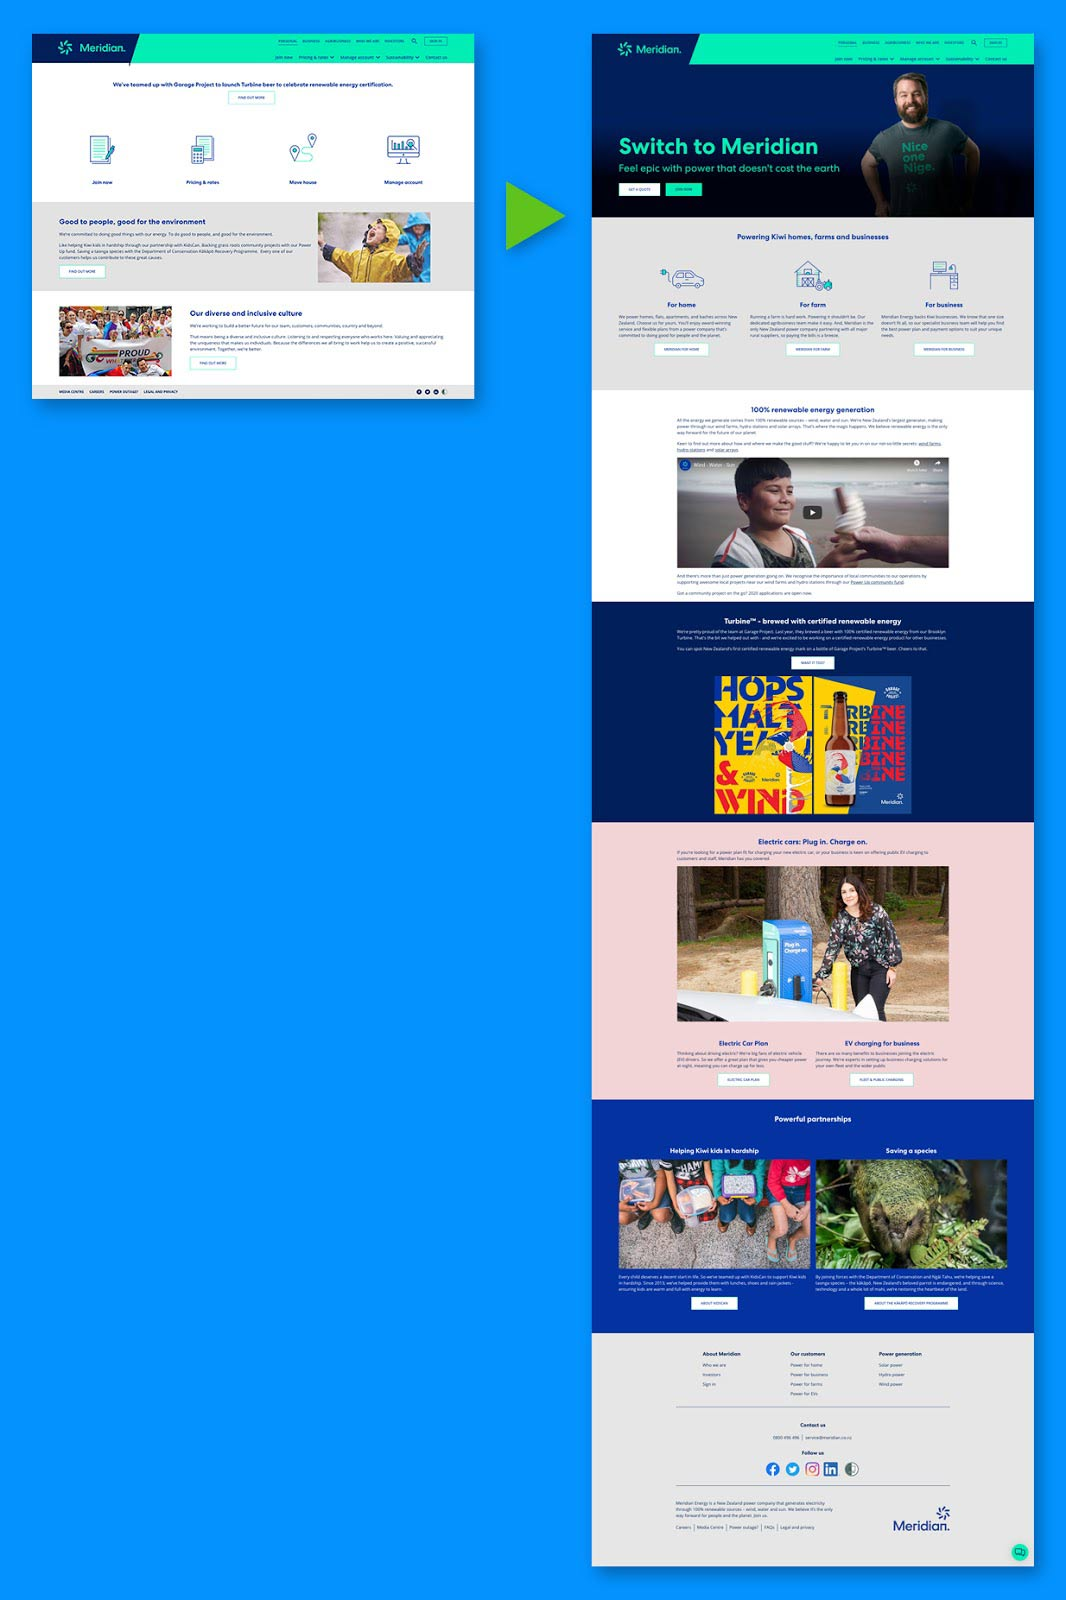 Meridian Website Comparison